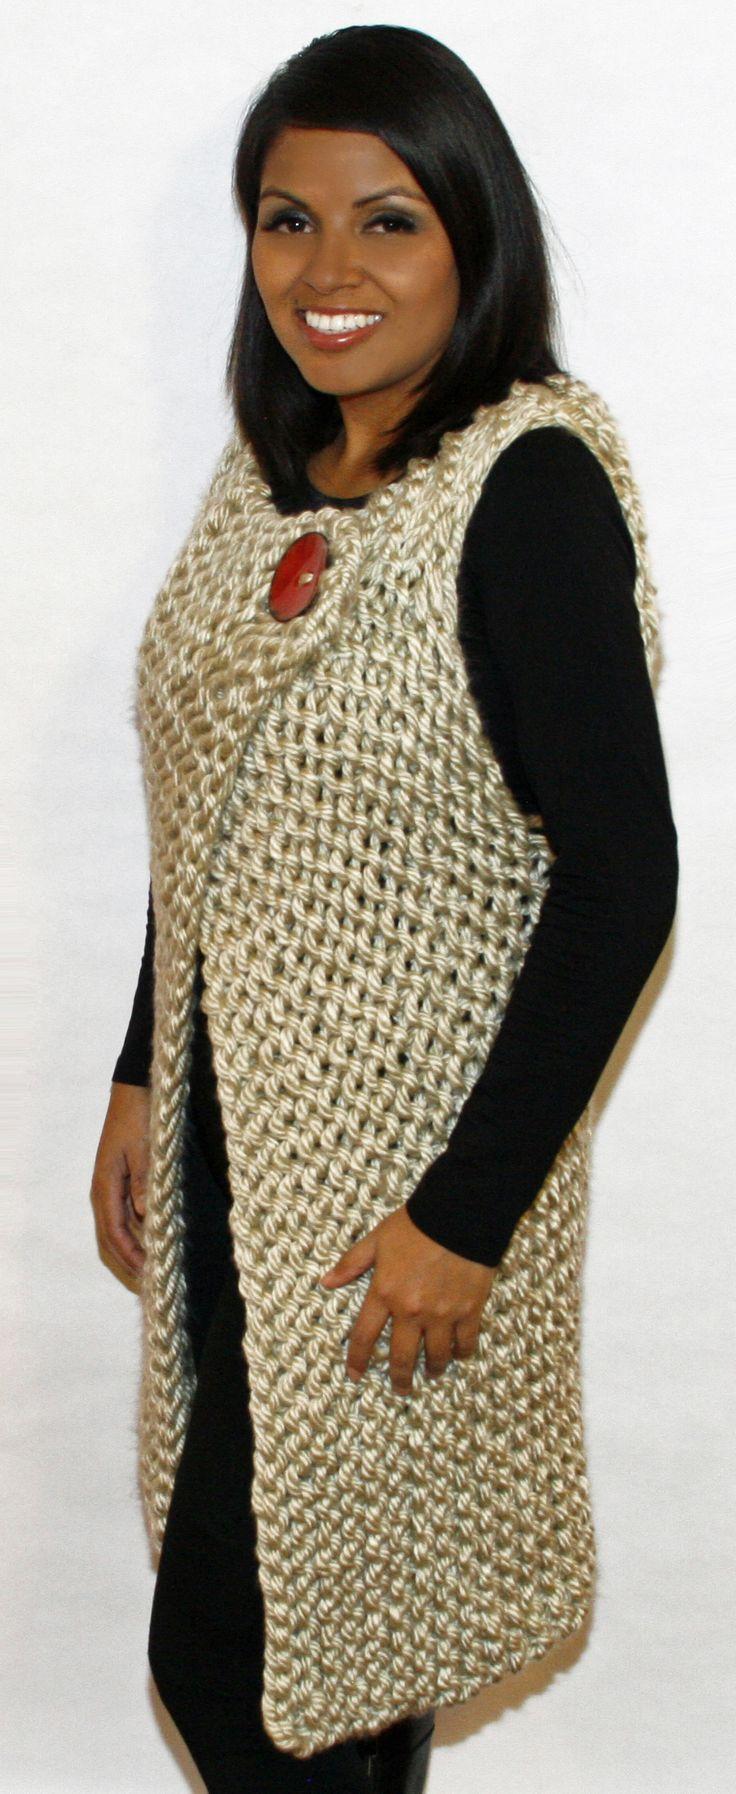 571 best loom knitting images on pinterest loom knitting zippy wrap 2 loom knitting patternsknitting bankloansurffo Choice Image